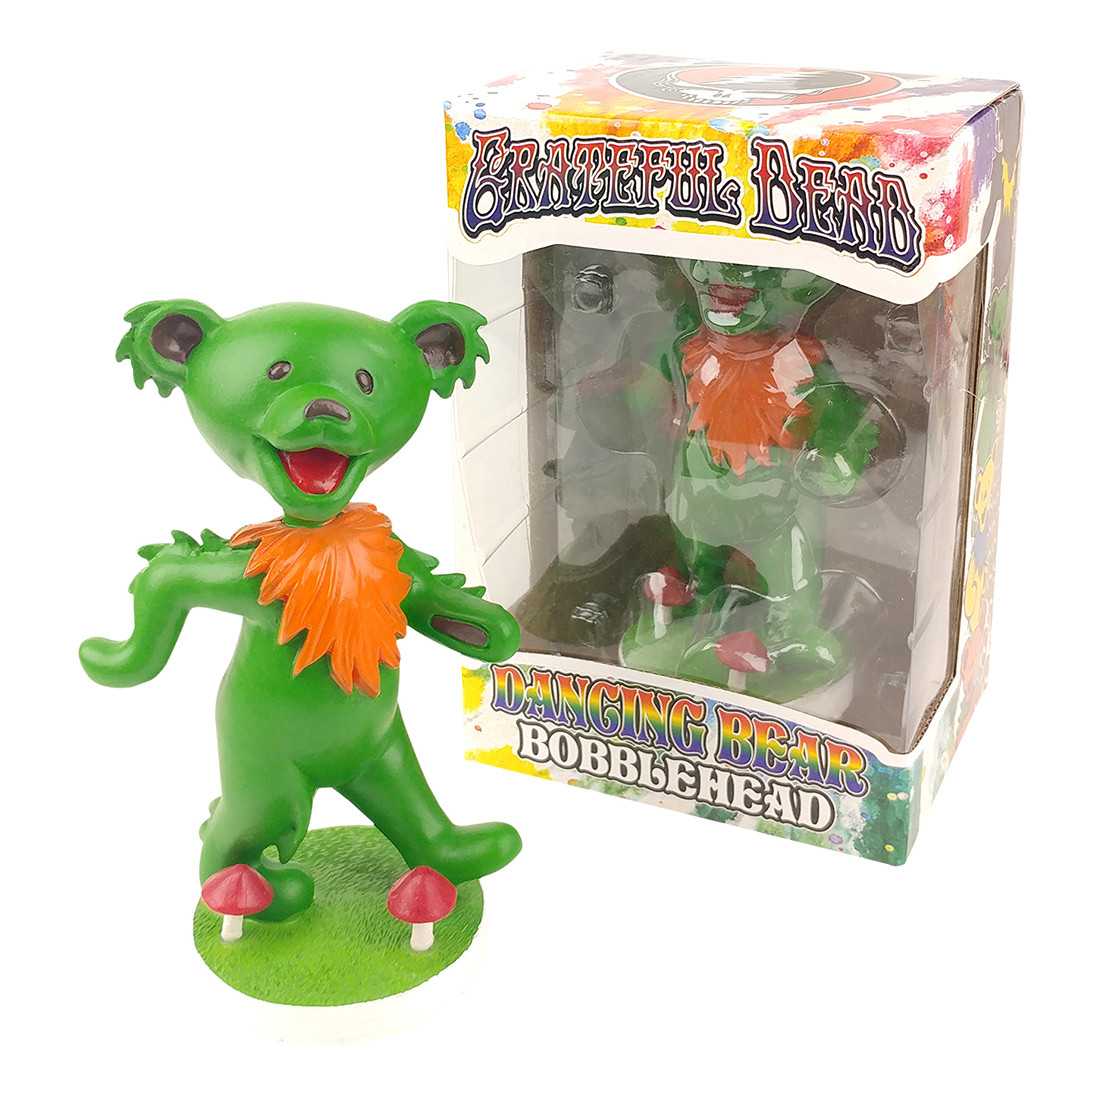 GD Bobblehead Dancing Bear Green